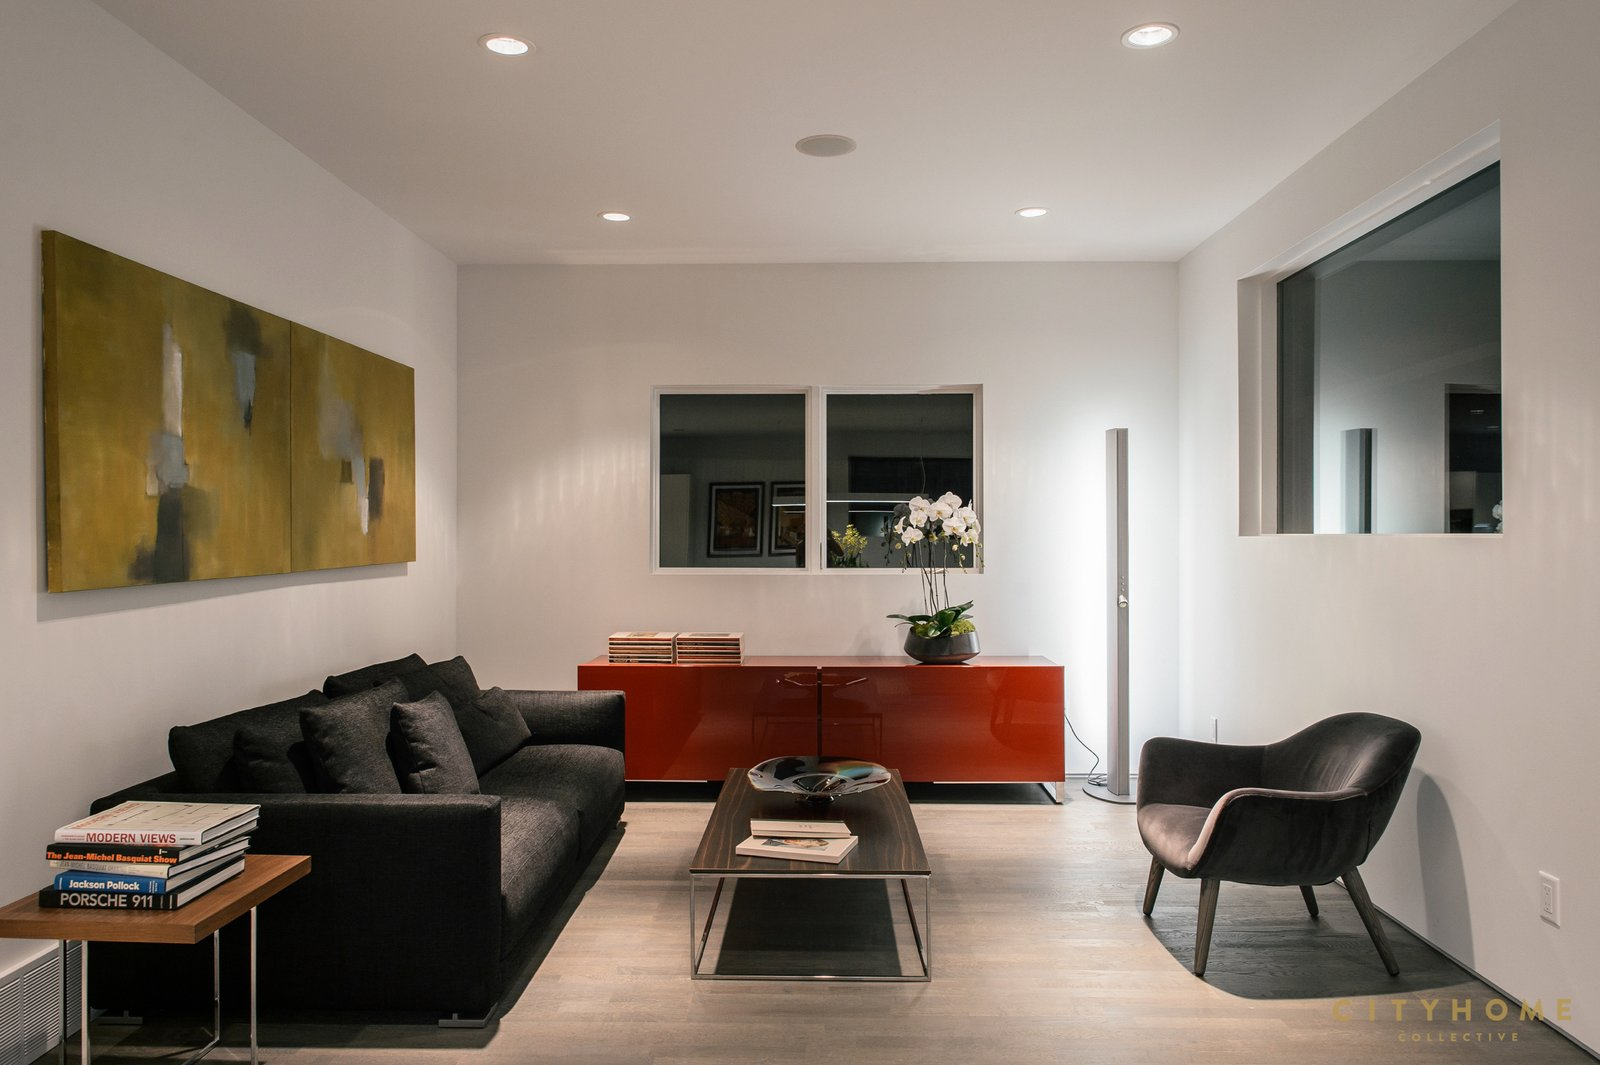 sitting area  Sugarhouse Studio by Brent  Jespersen